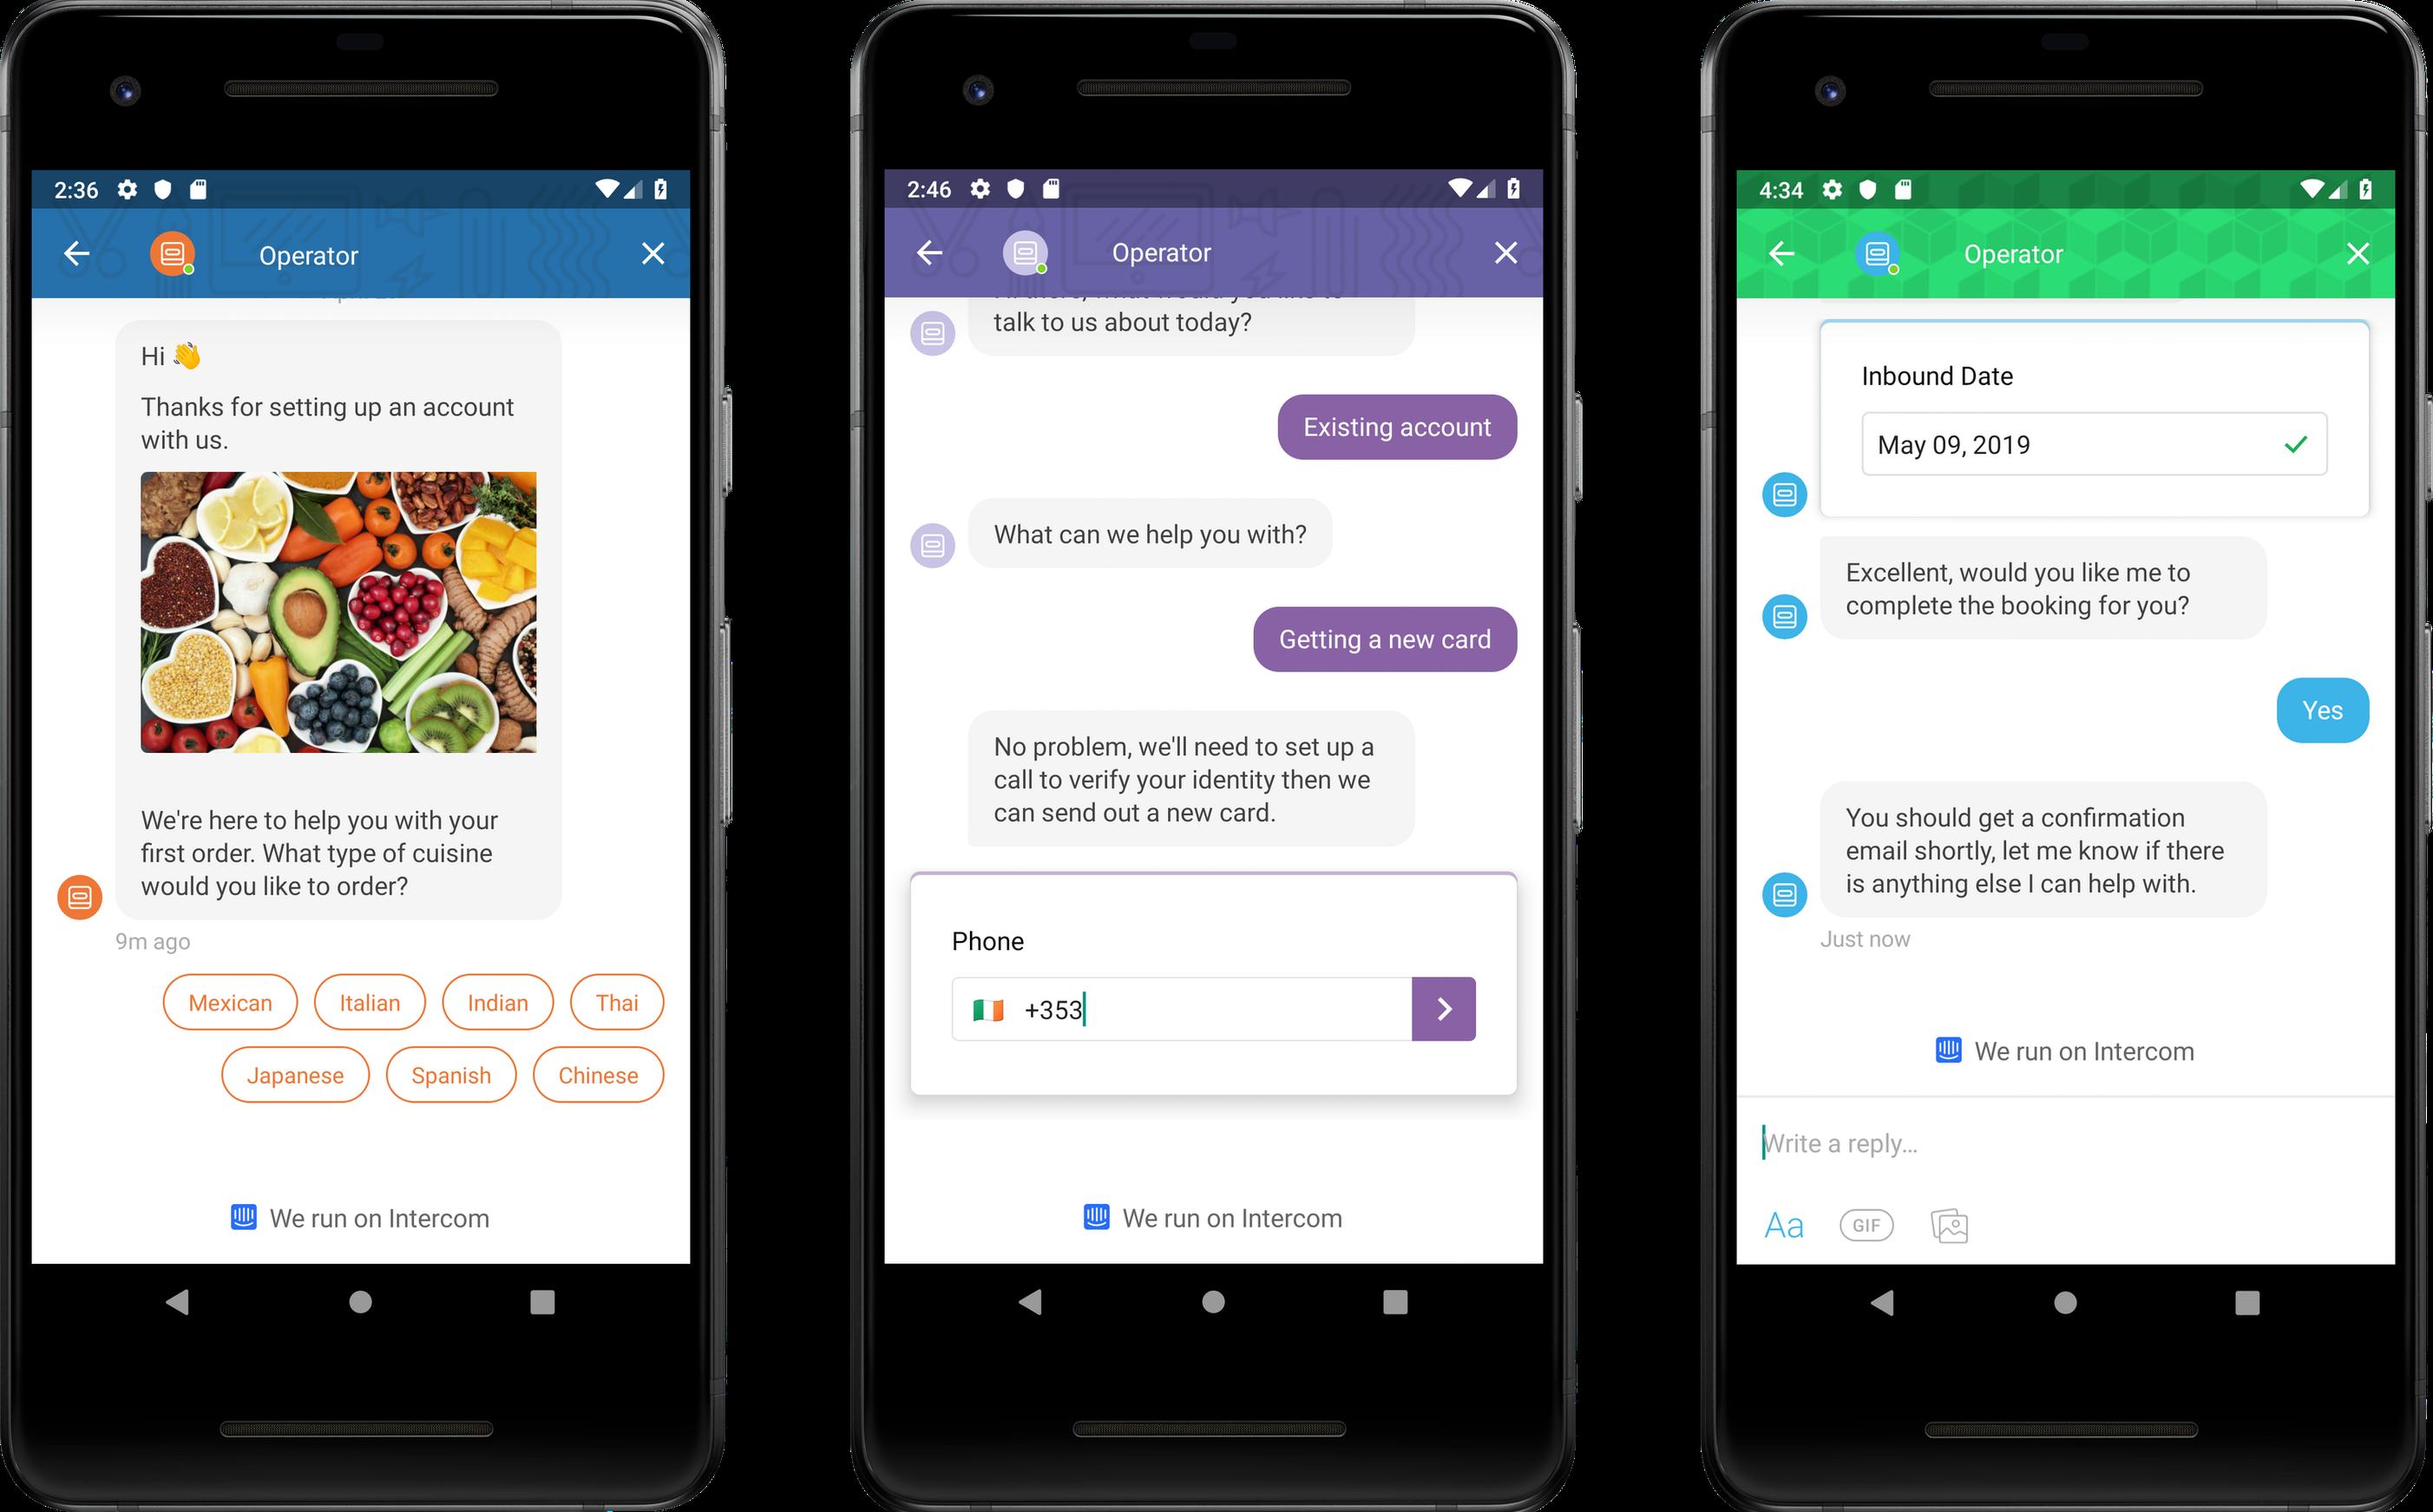 intercom-android/CHANGELOG md at master · intercom/intercom-android